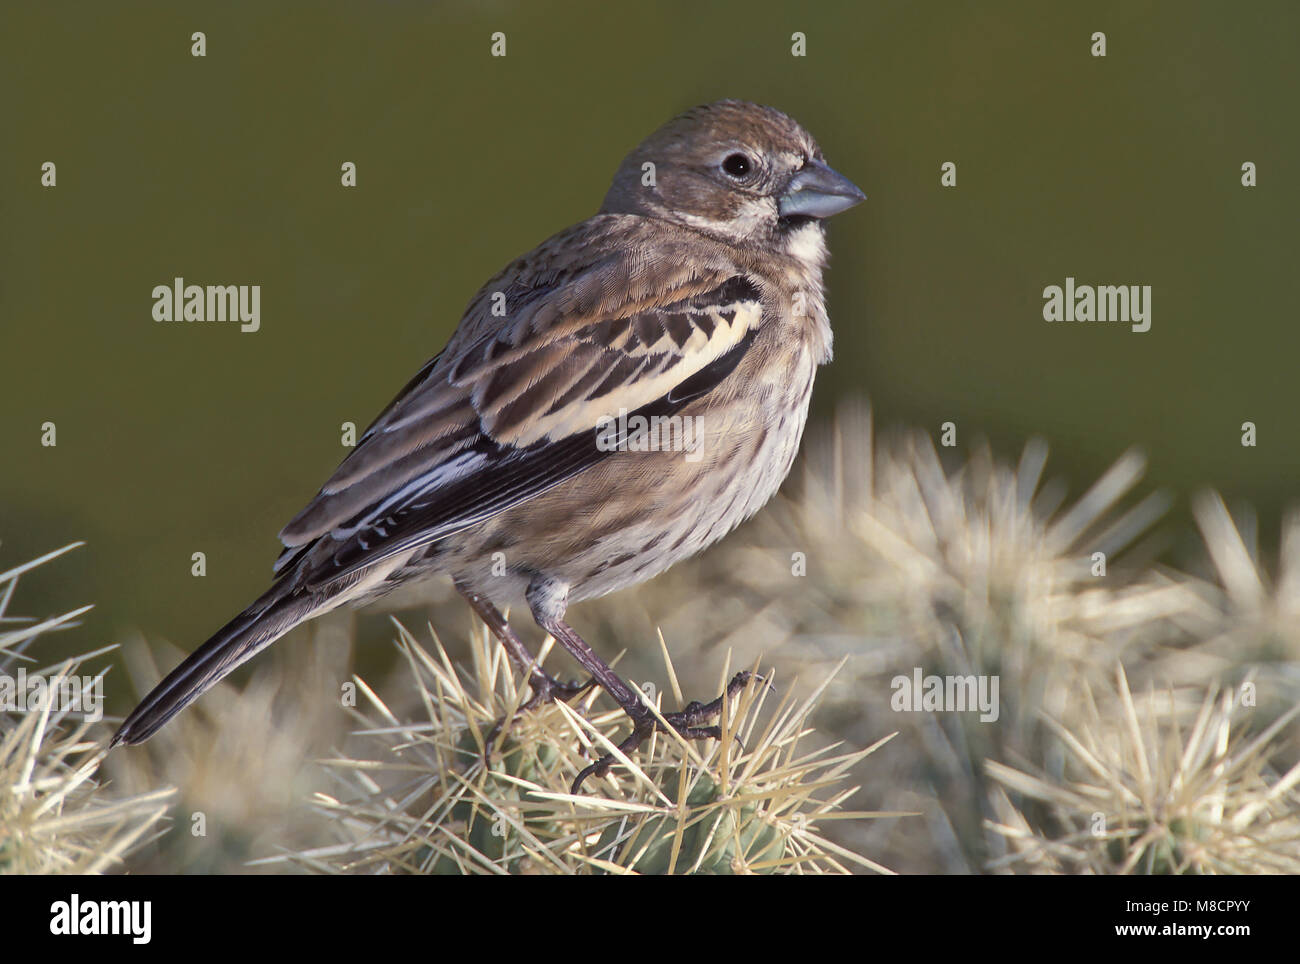 Adult male non-breeding Pima Co., AZ December 2002 - Stock Image